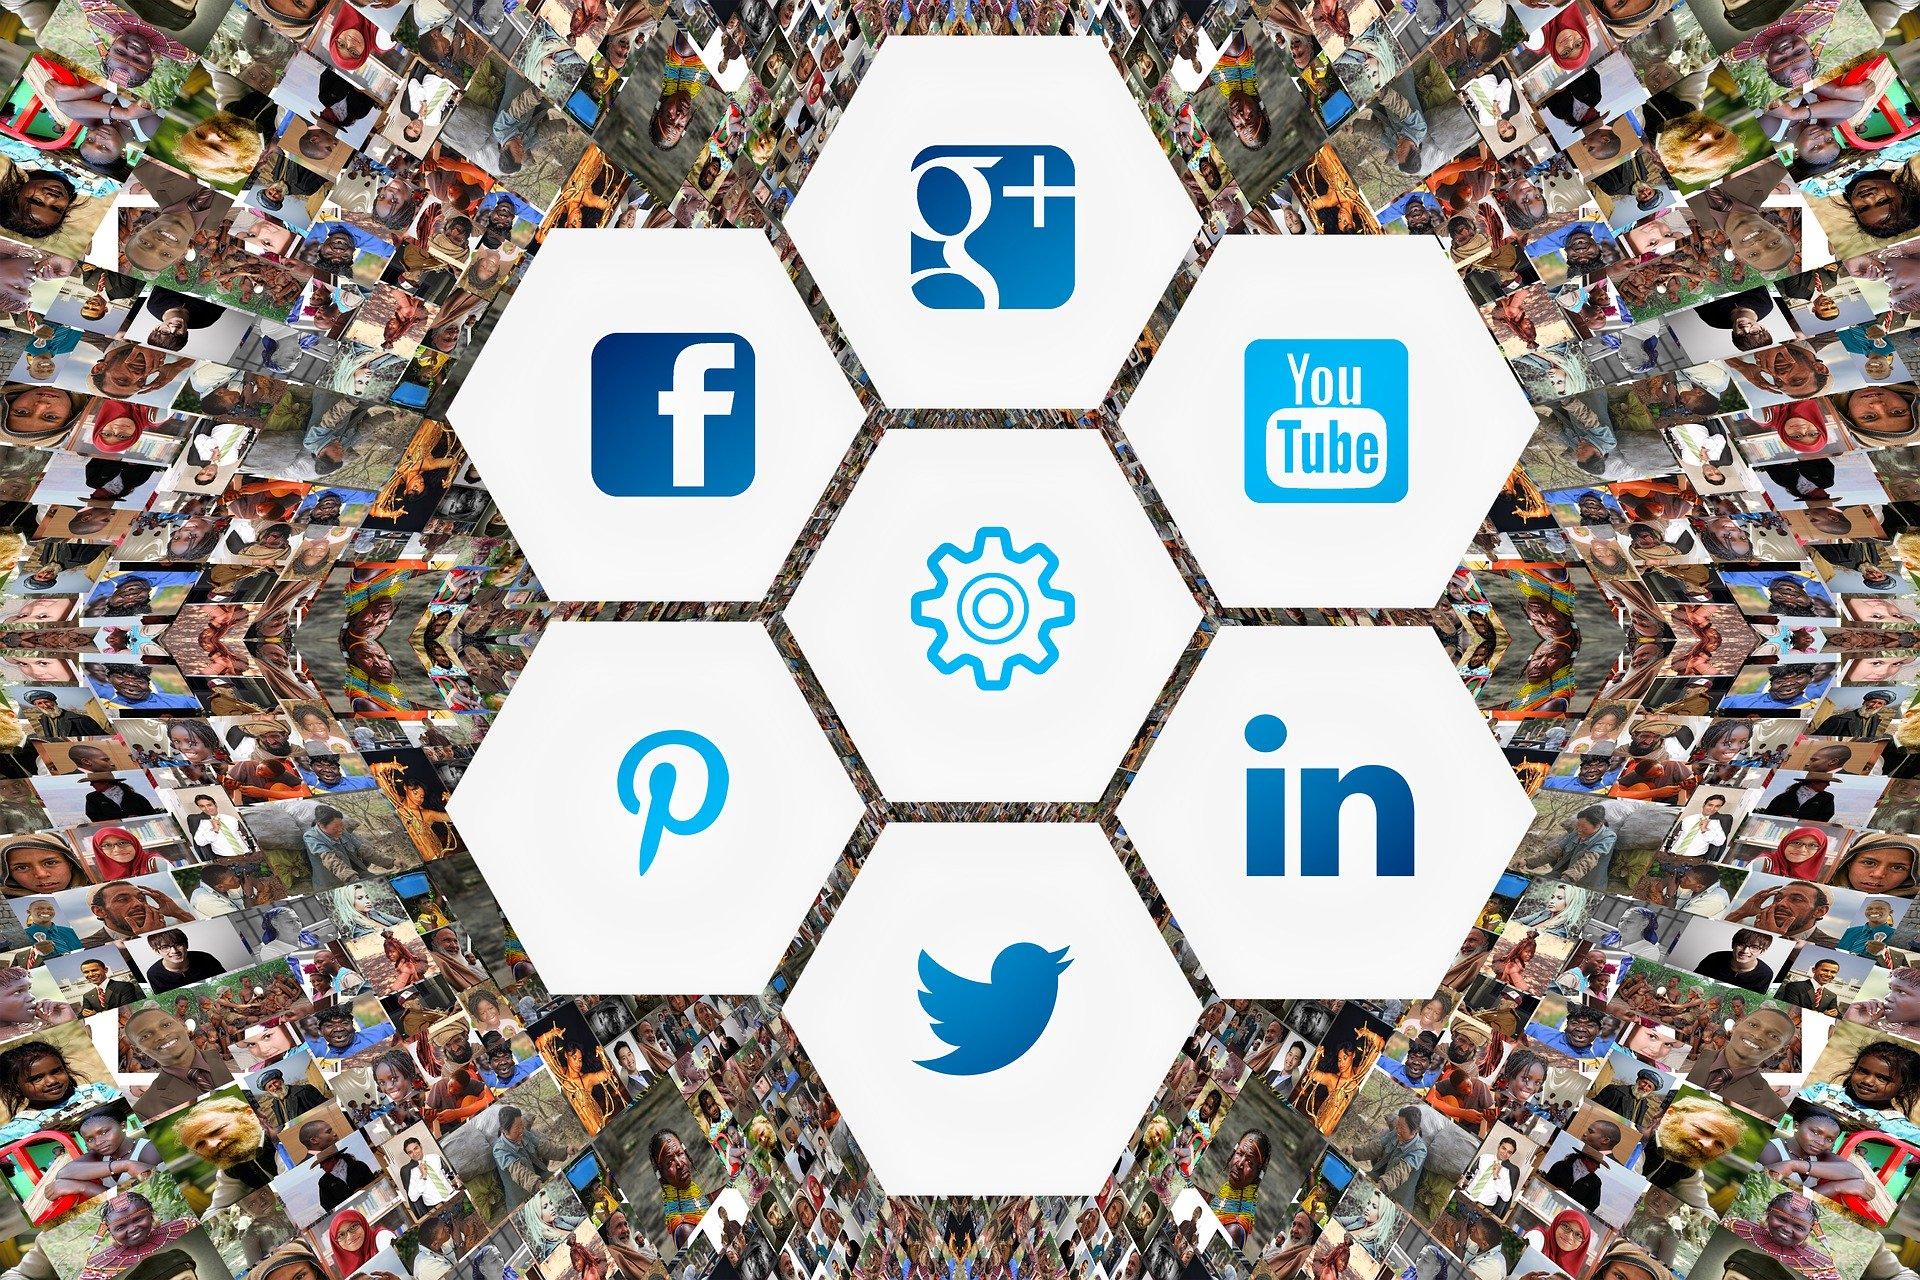 social-media-faces-photo-album-3129481